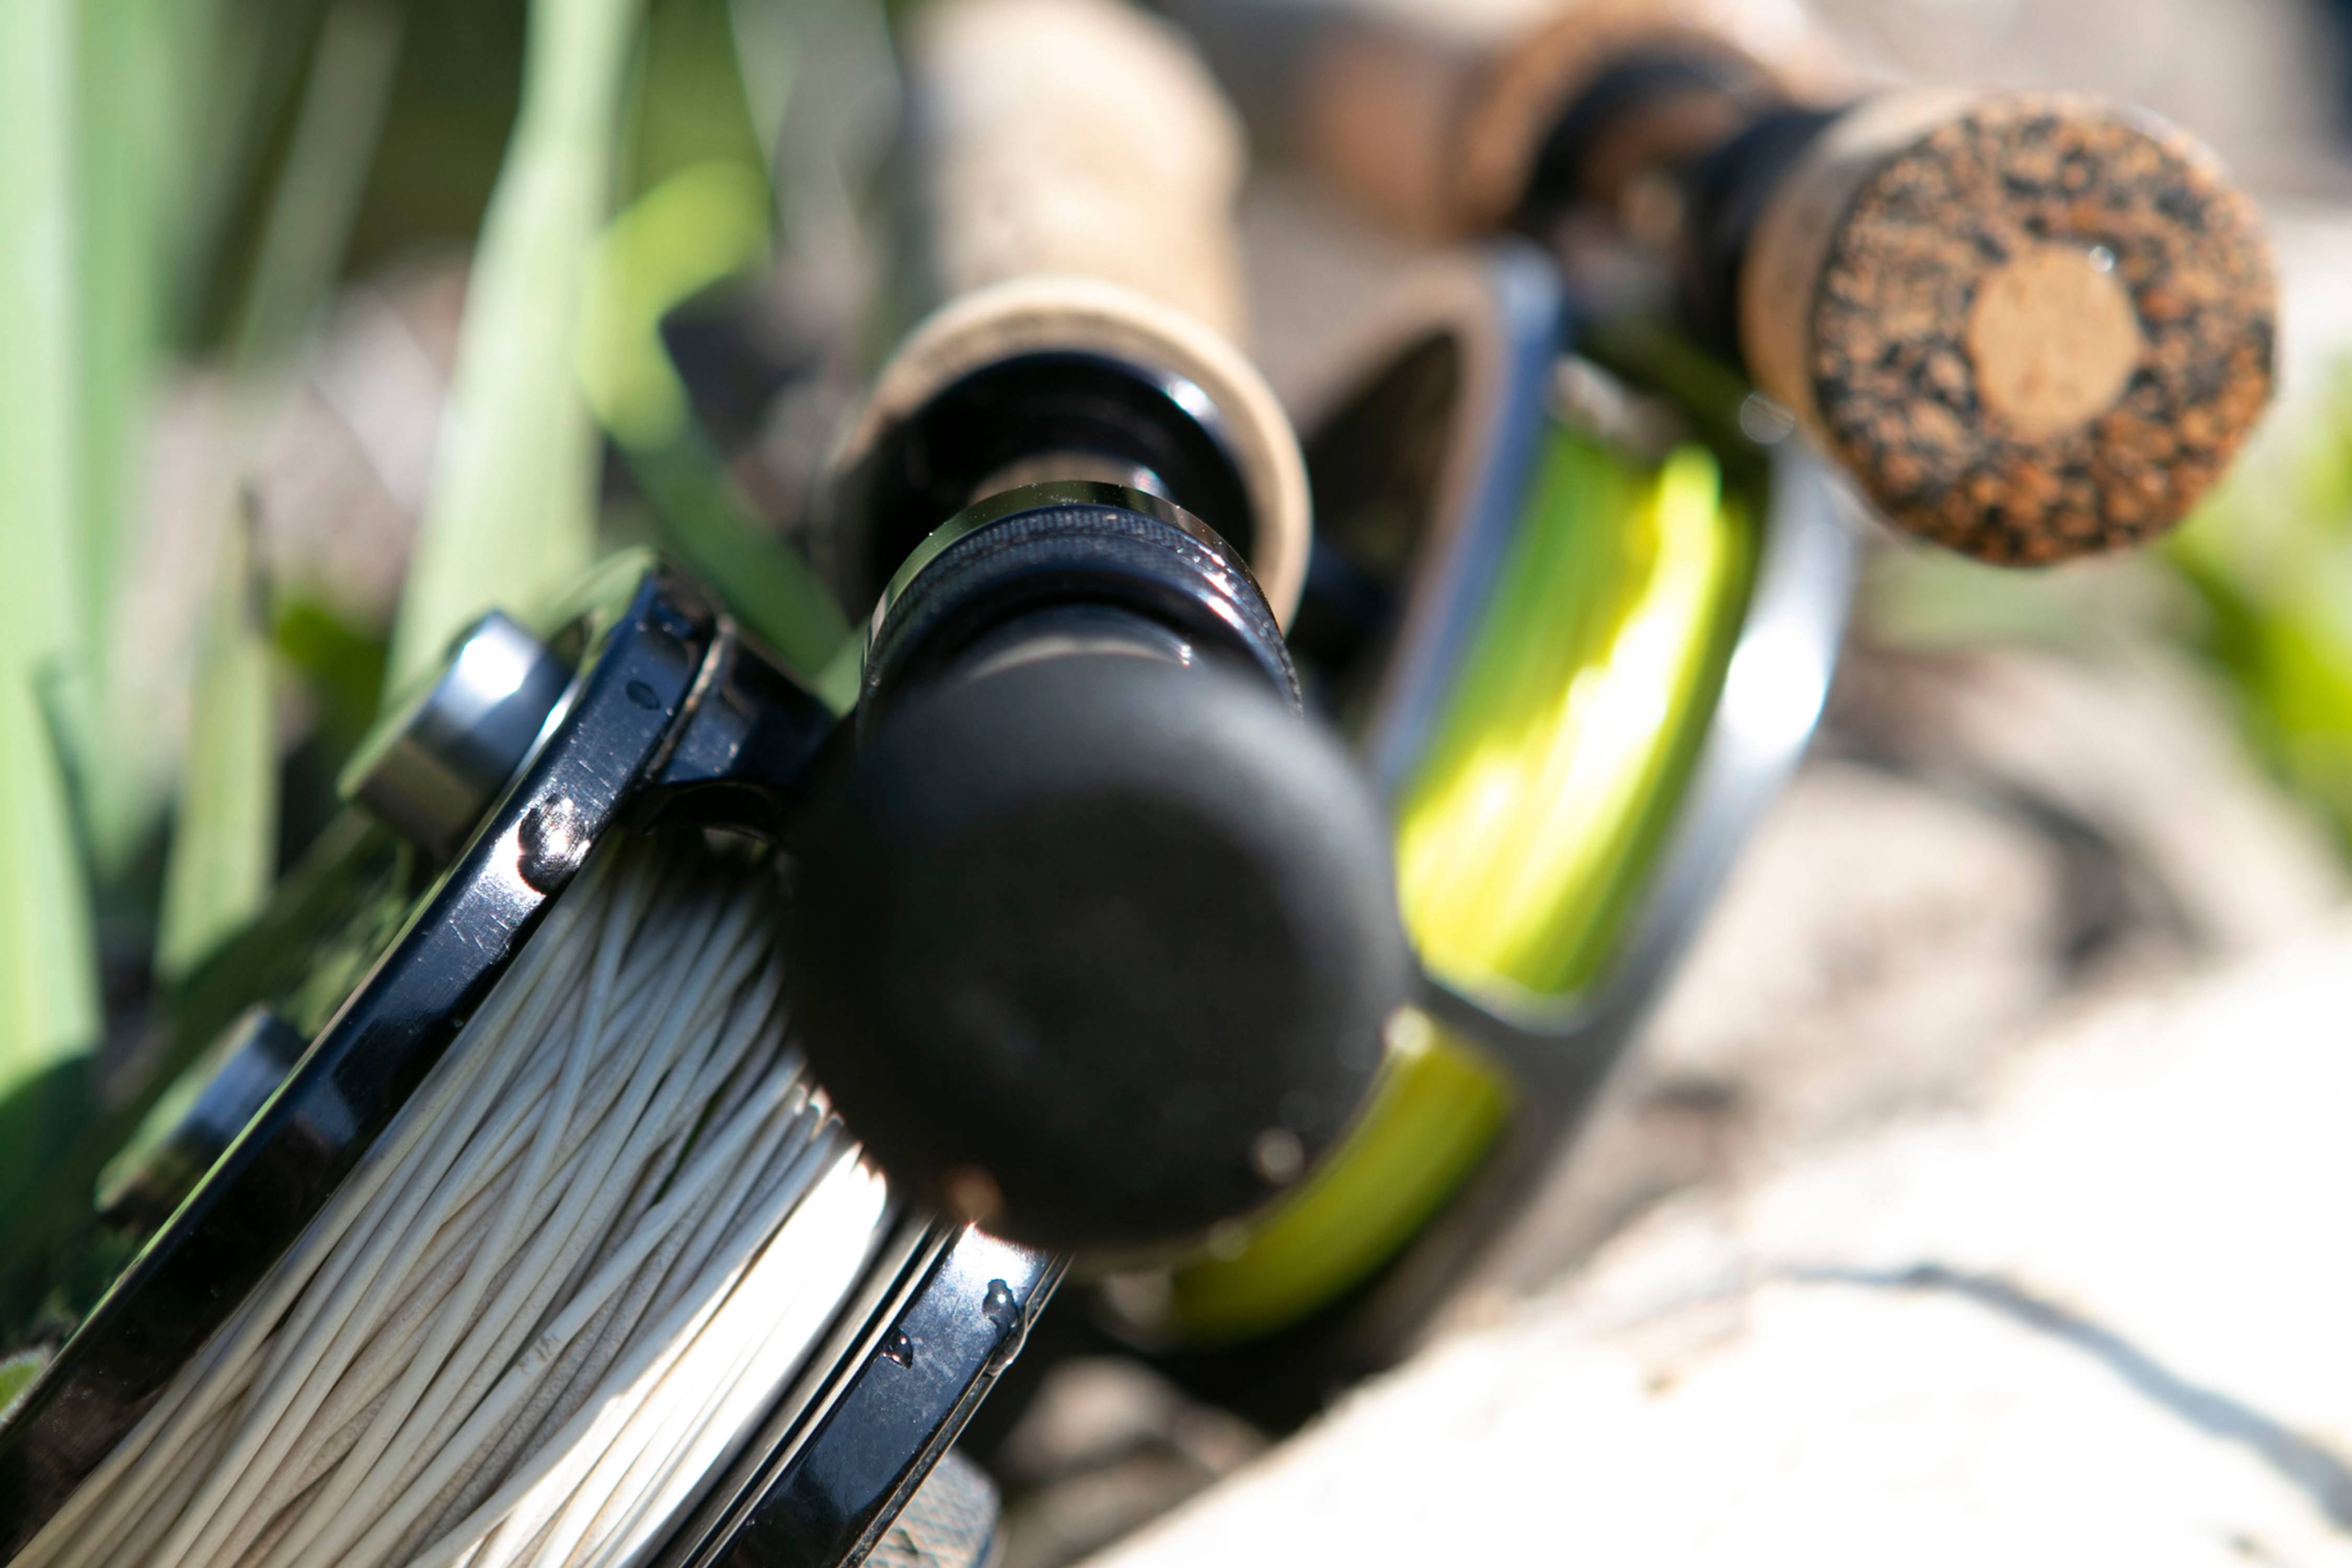 Day Fishing Ticket - 5 fish limit